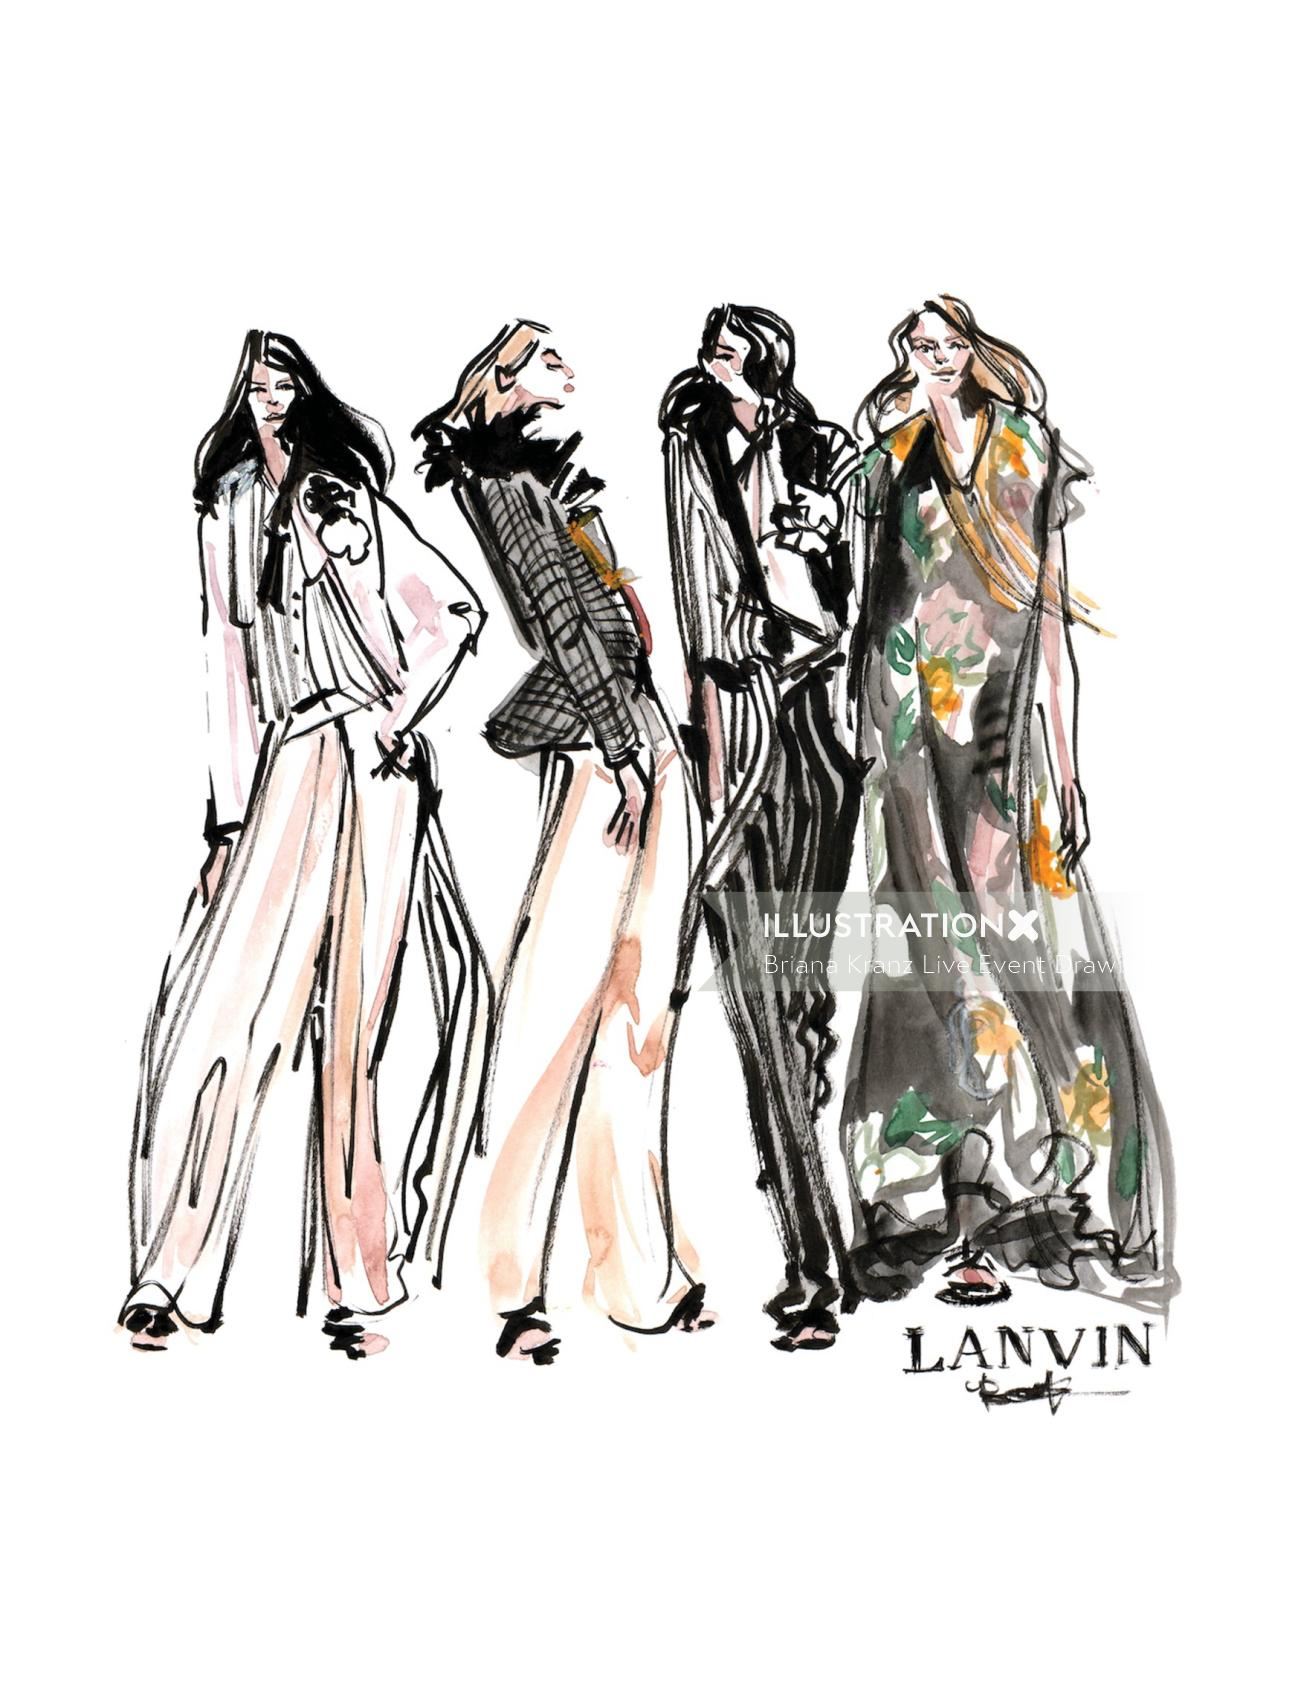 Women Fashion Illustration For Lanvin